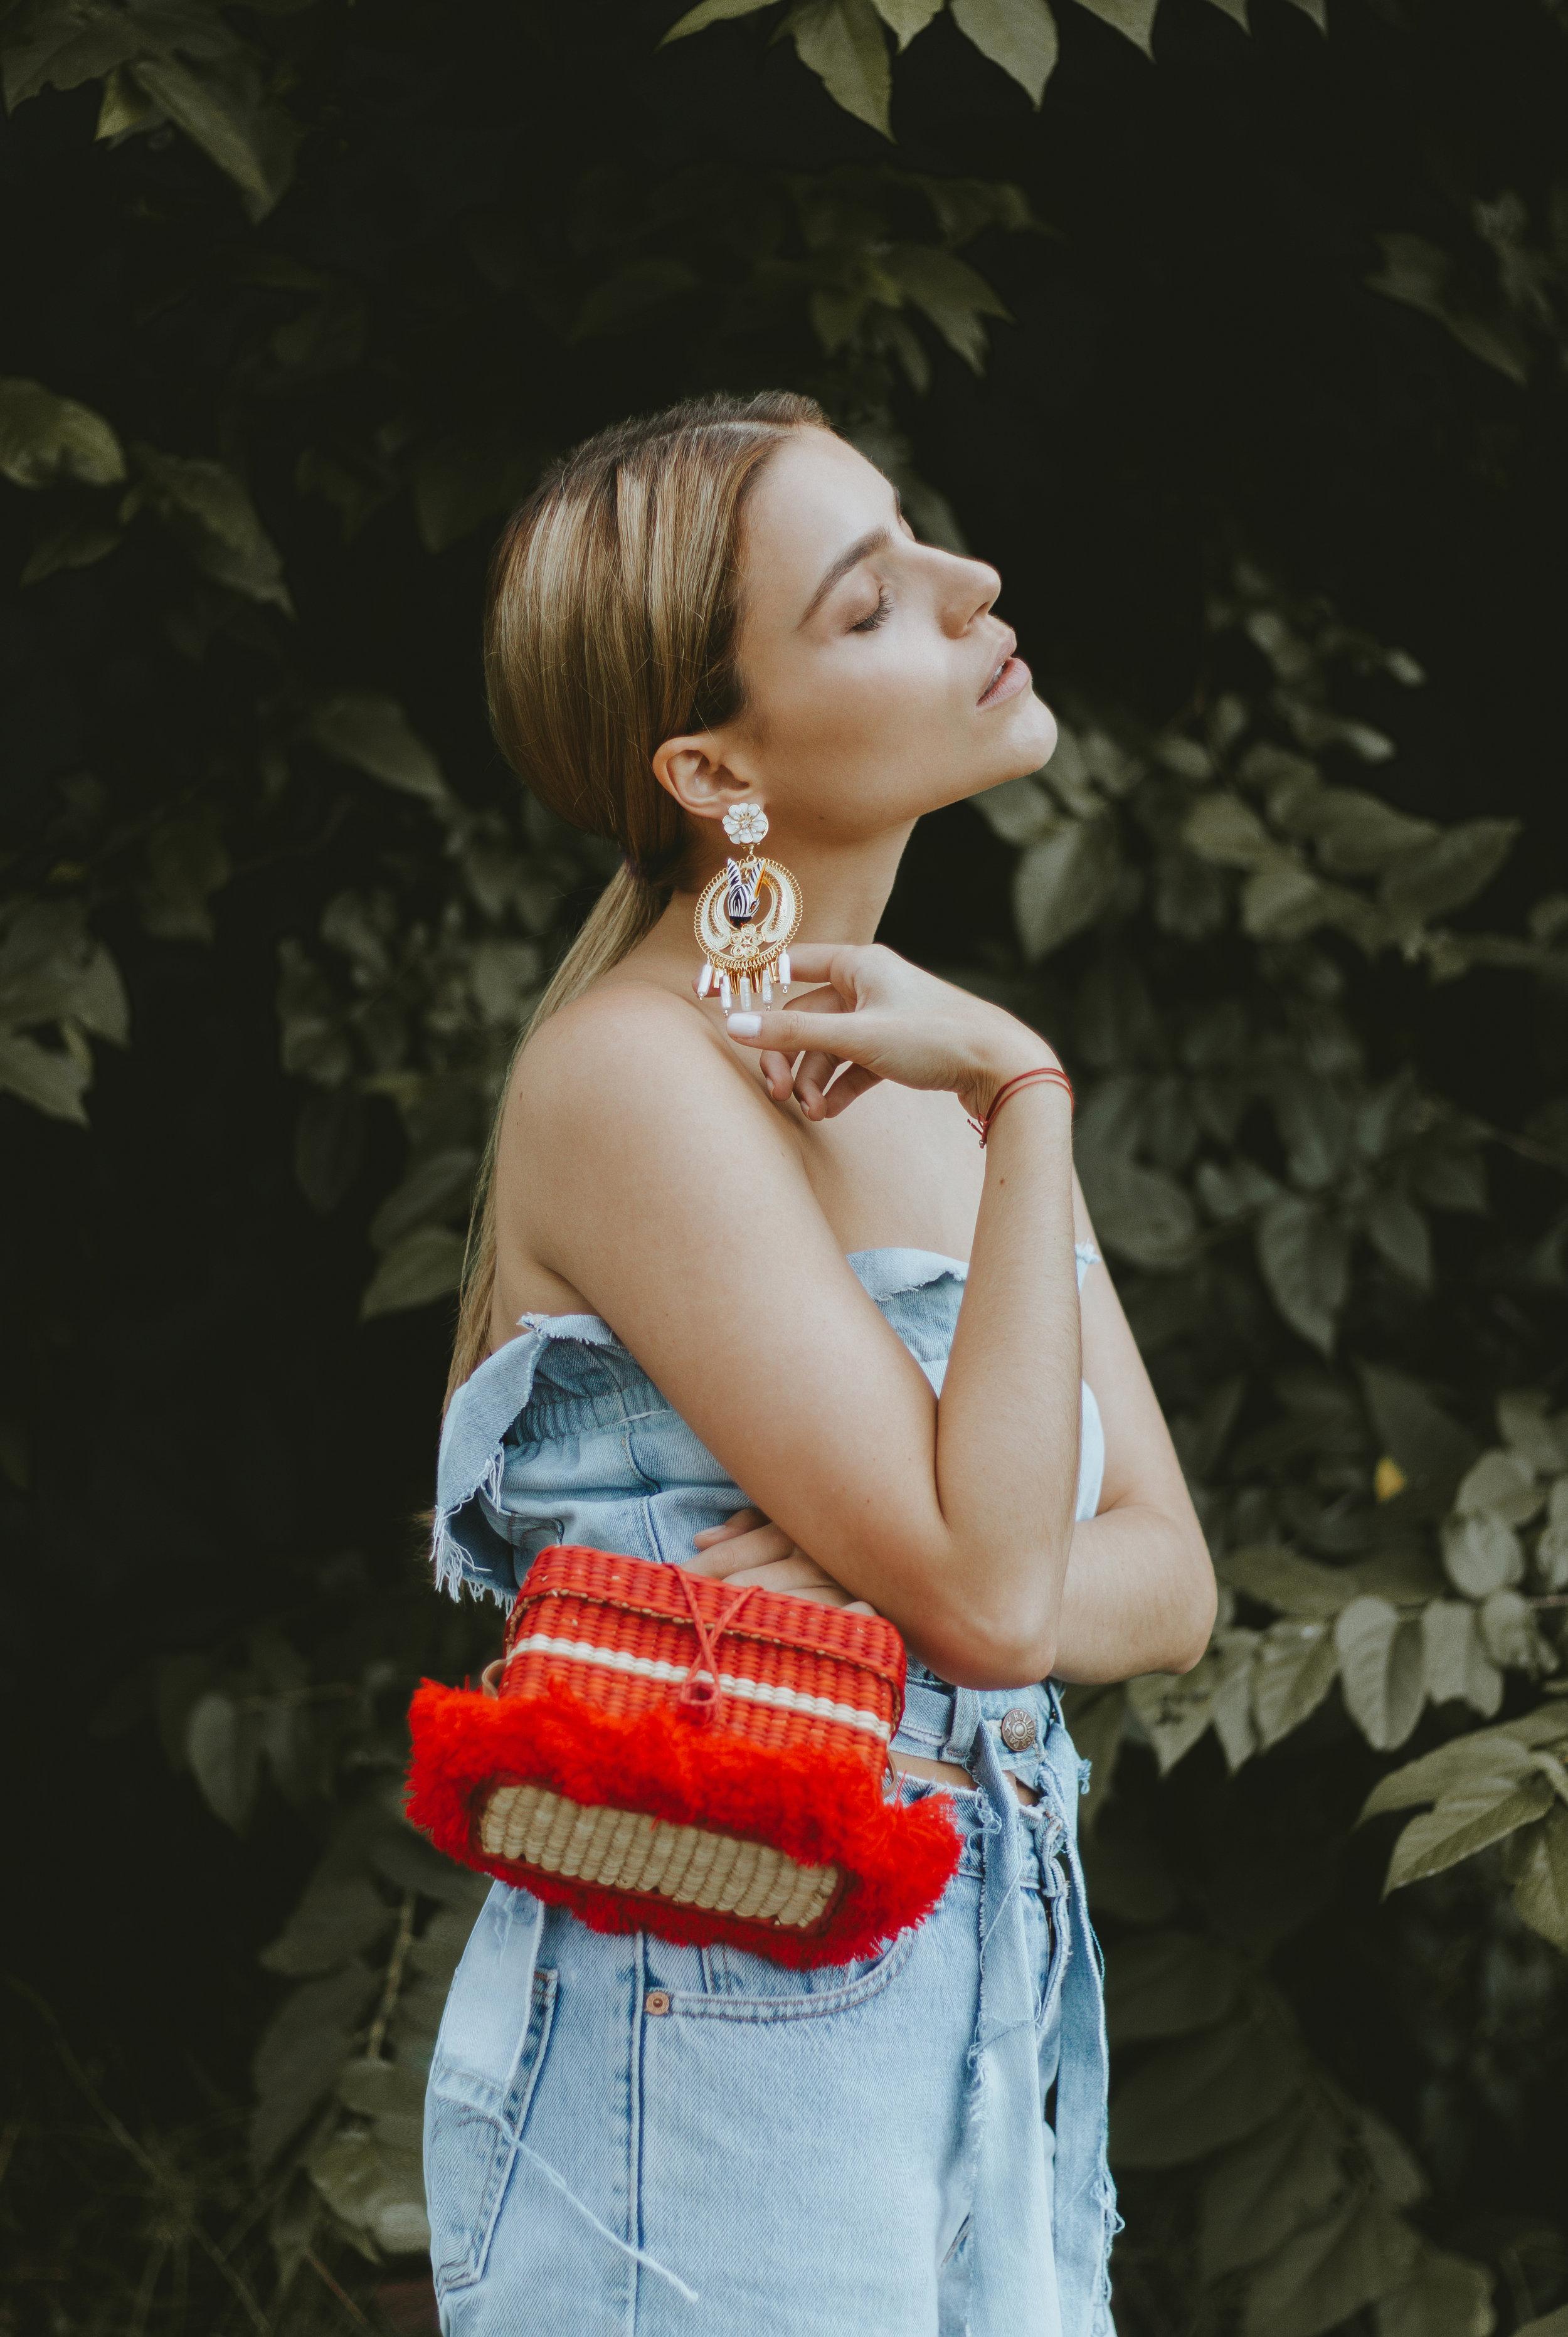 Andrea Kader tube top  Levi's reworked denim  Mercedes Salazar earrings via Corazon de Piña